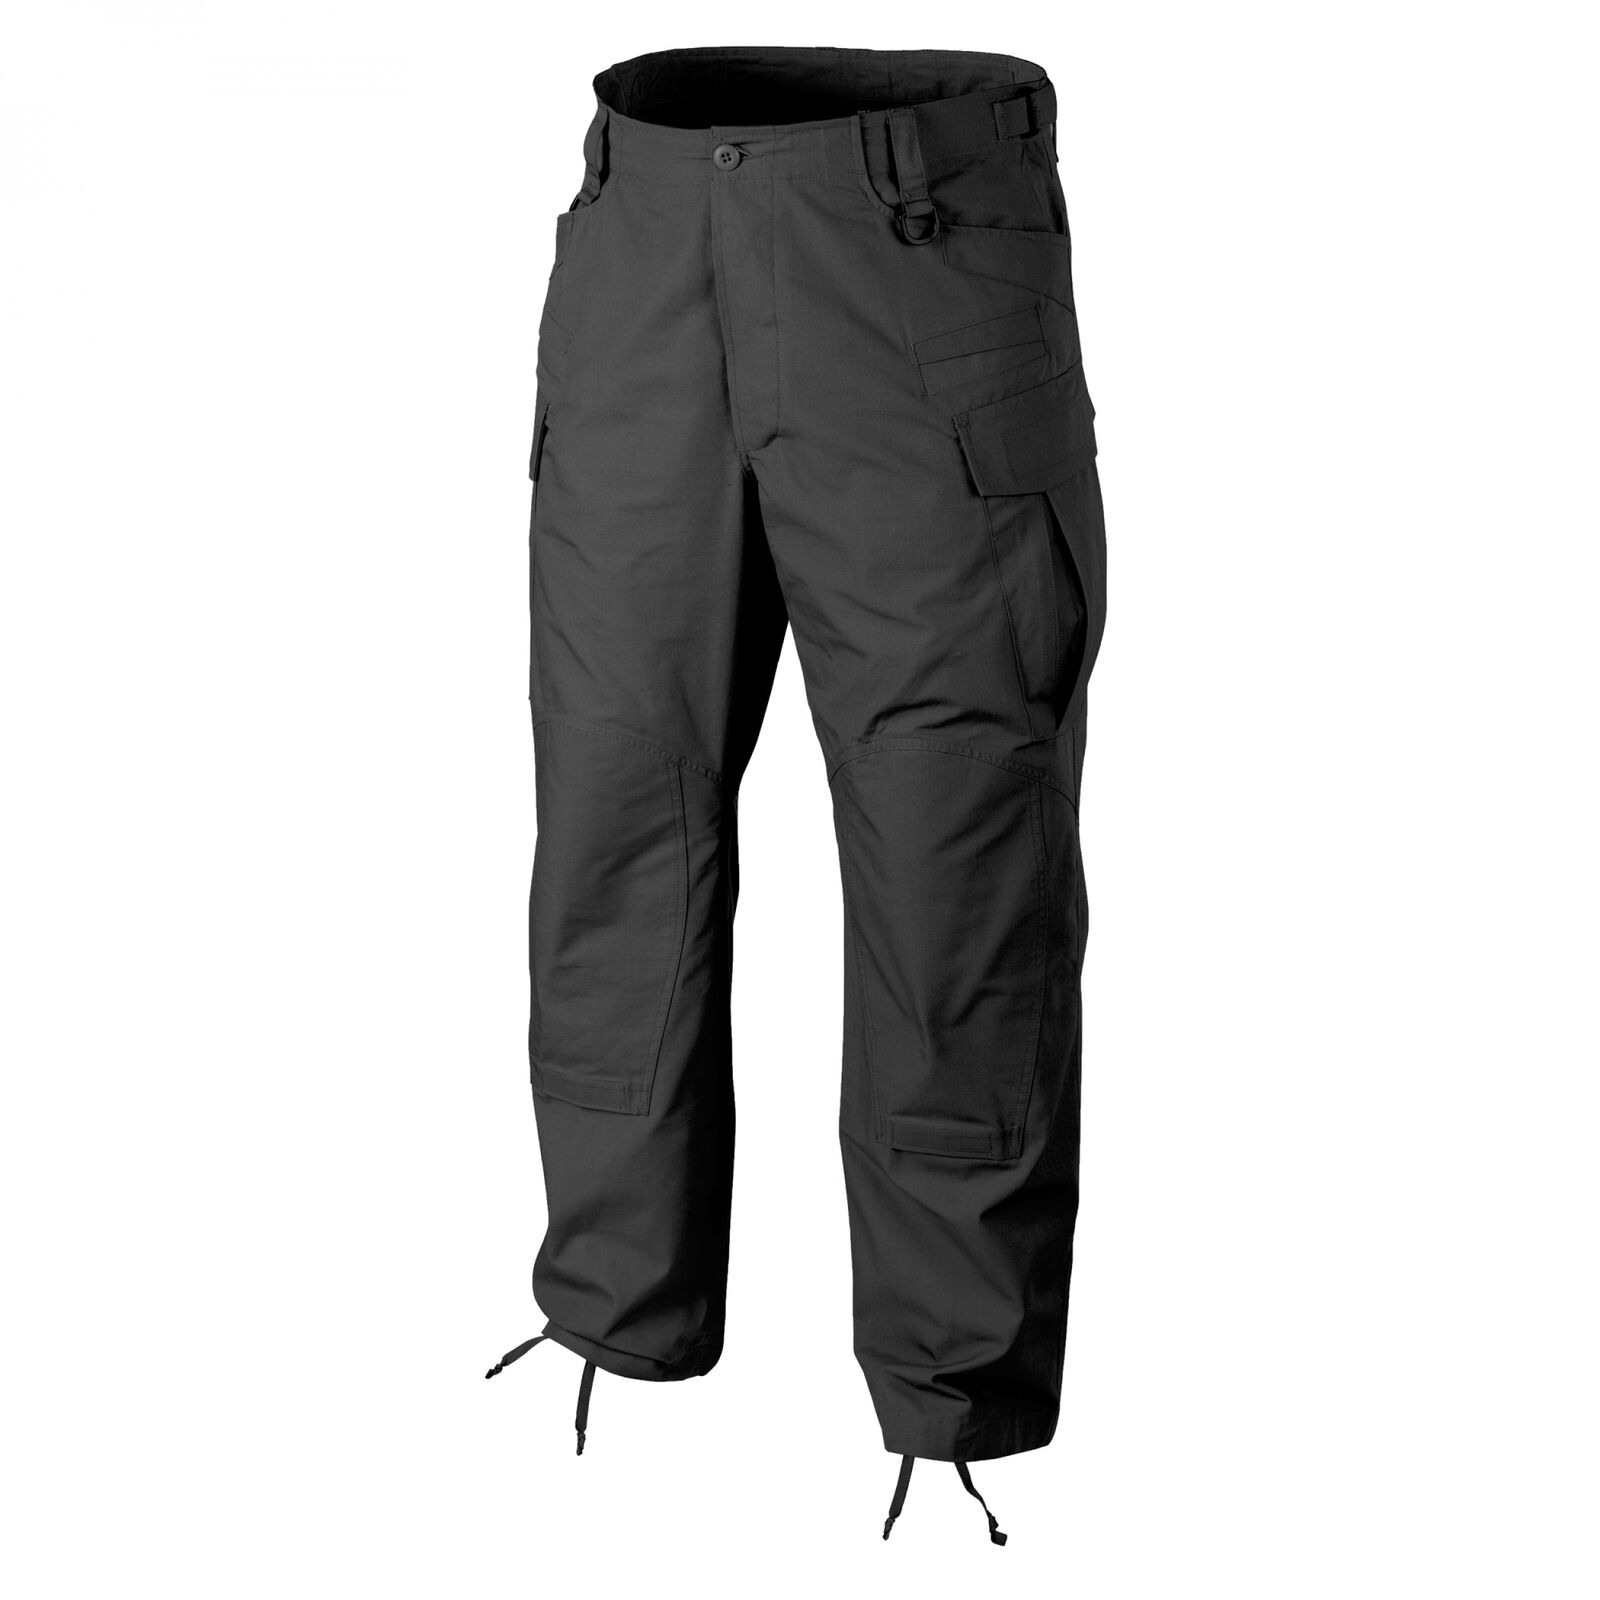 Helikon-Tex SFU Next Pants -PolyCotton Twill- black